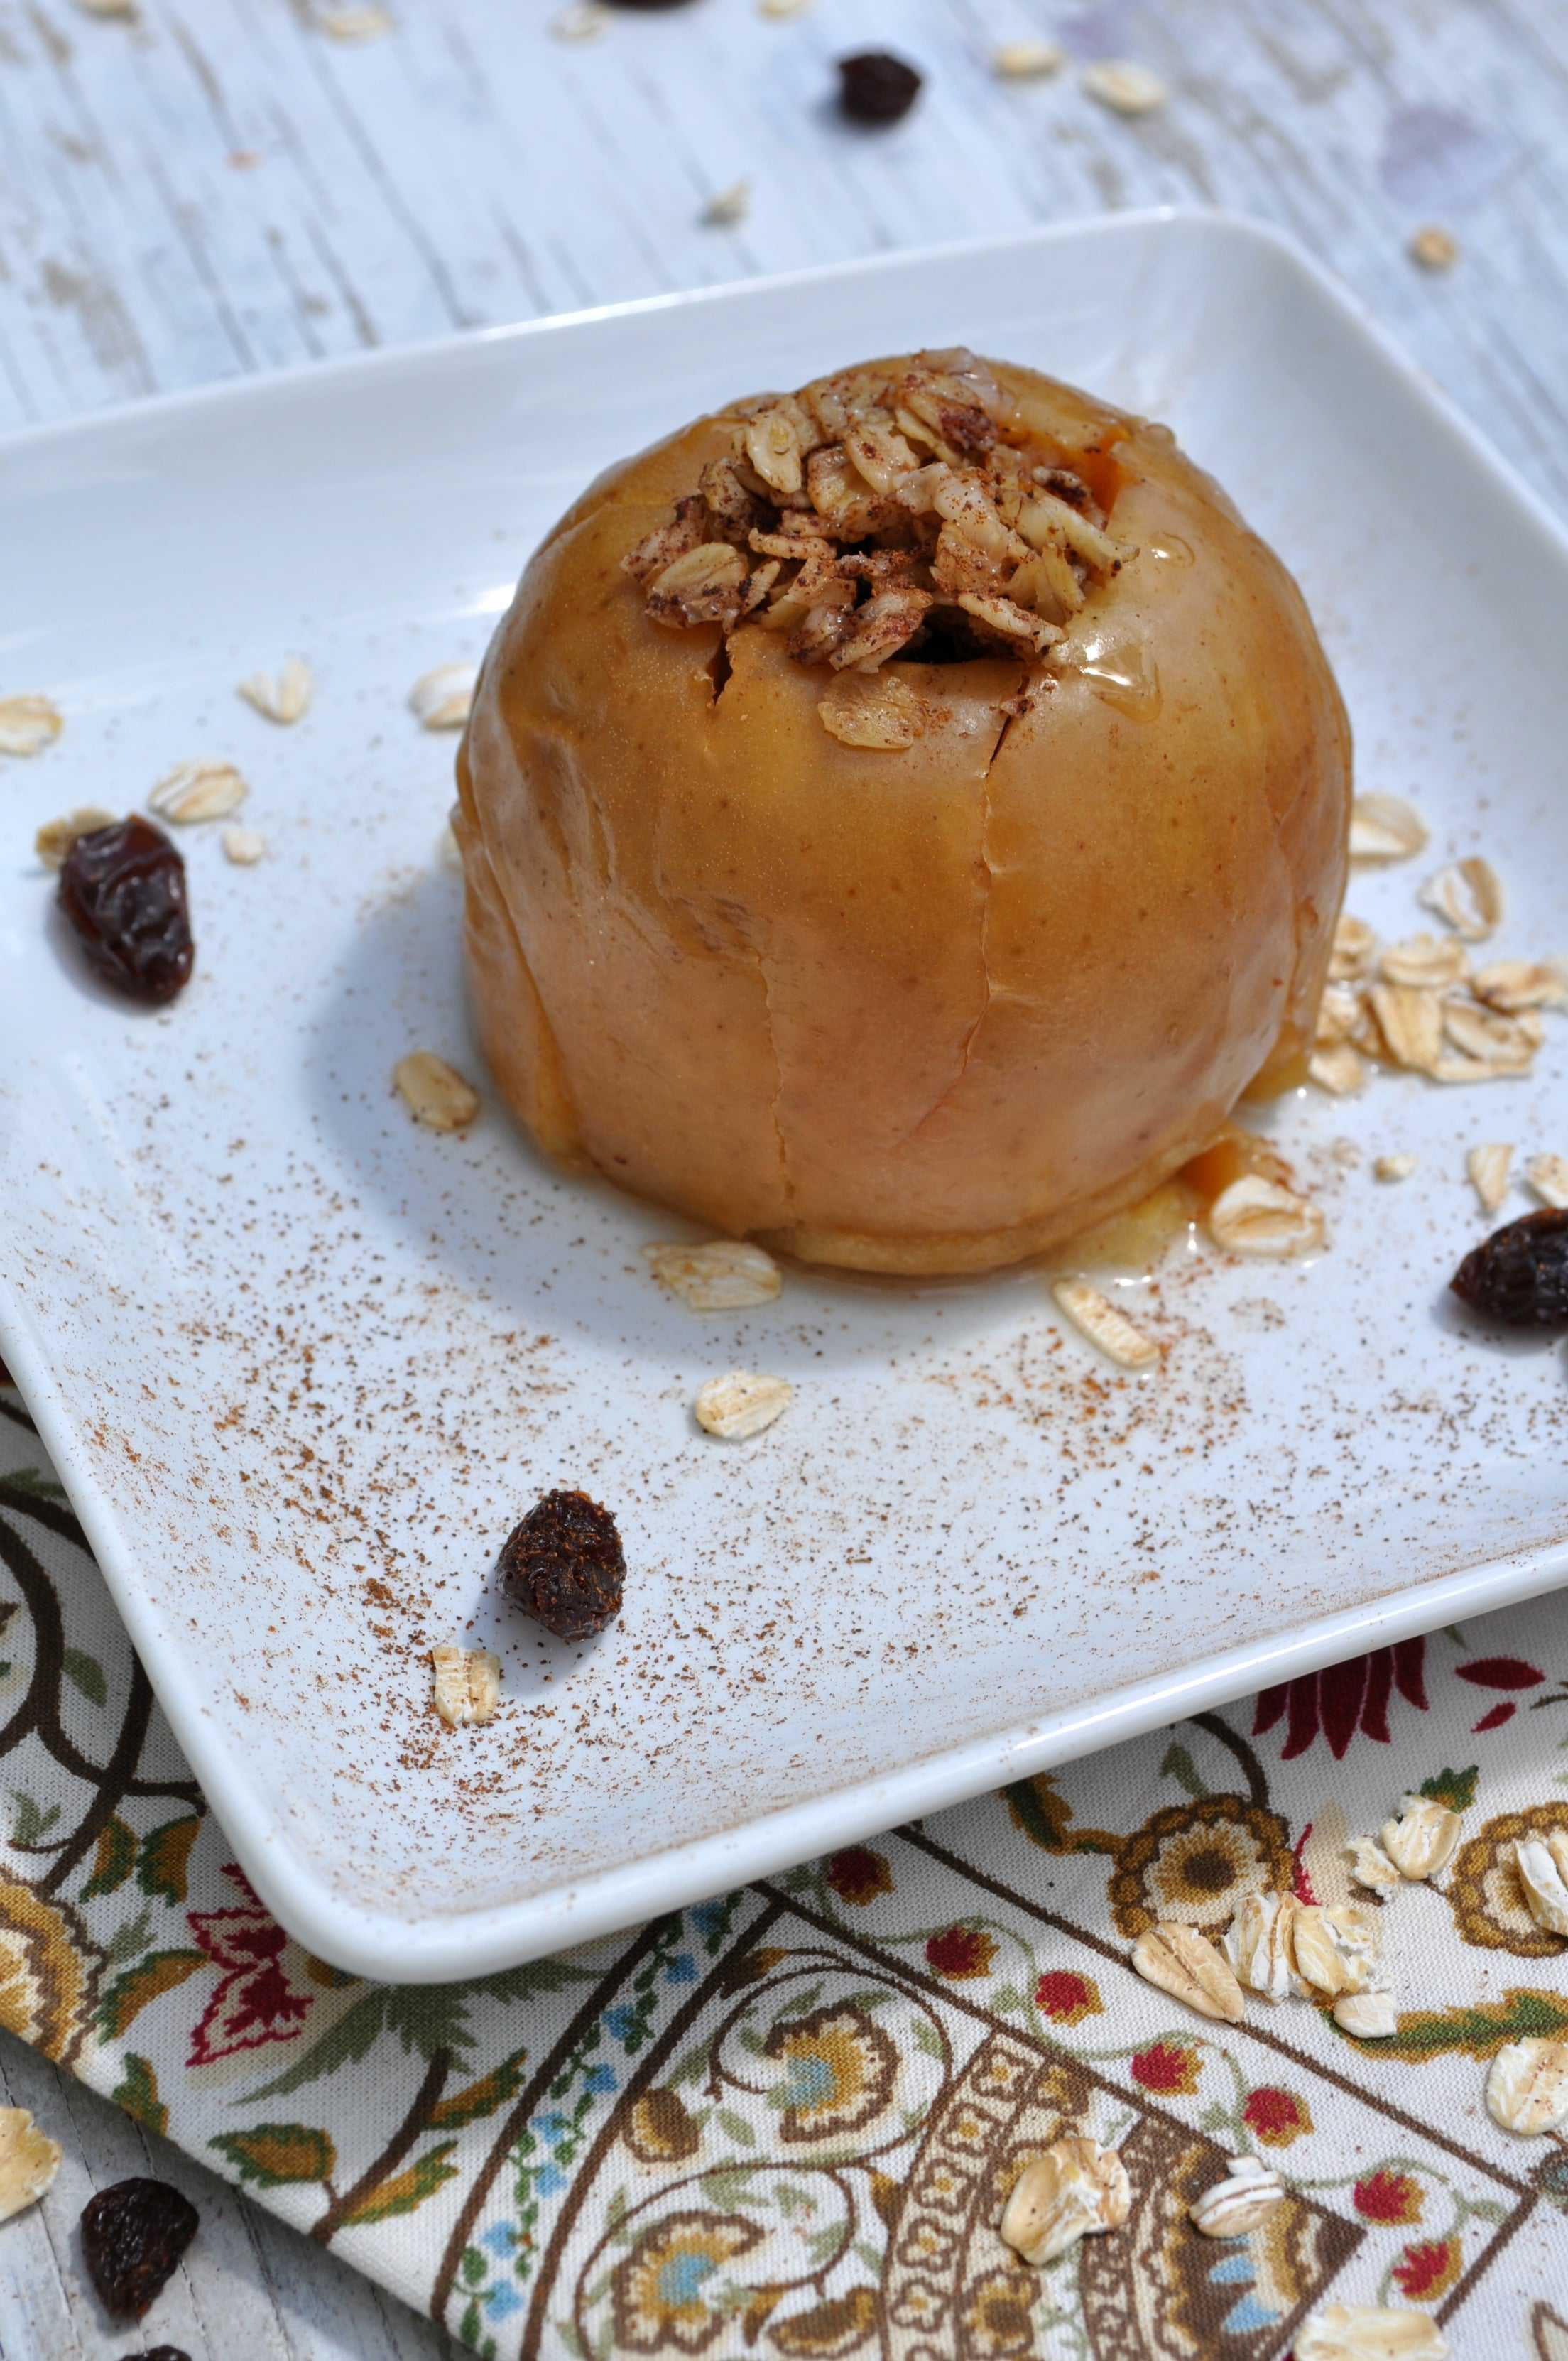 Slow Cooker Oatmeal Raisin Baked Apples - The Seasoned Mom